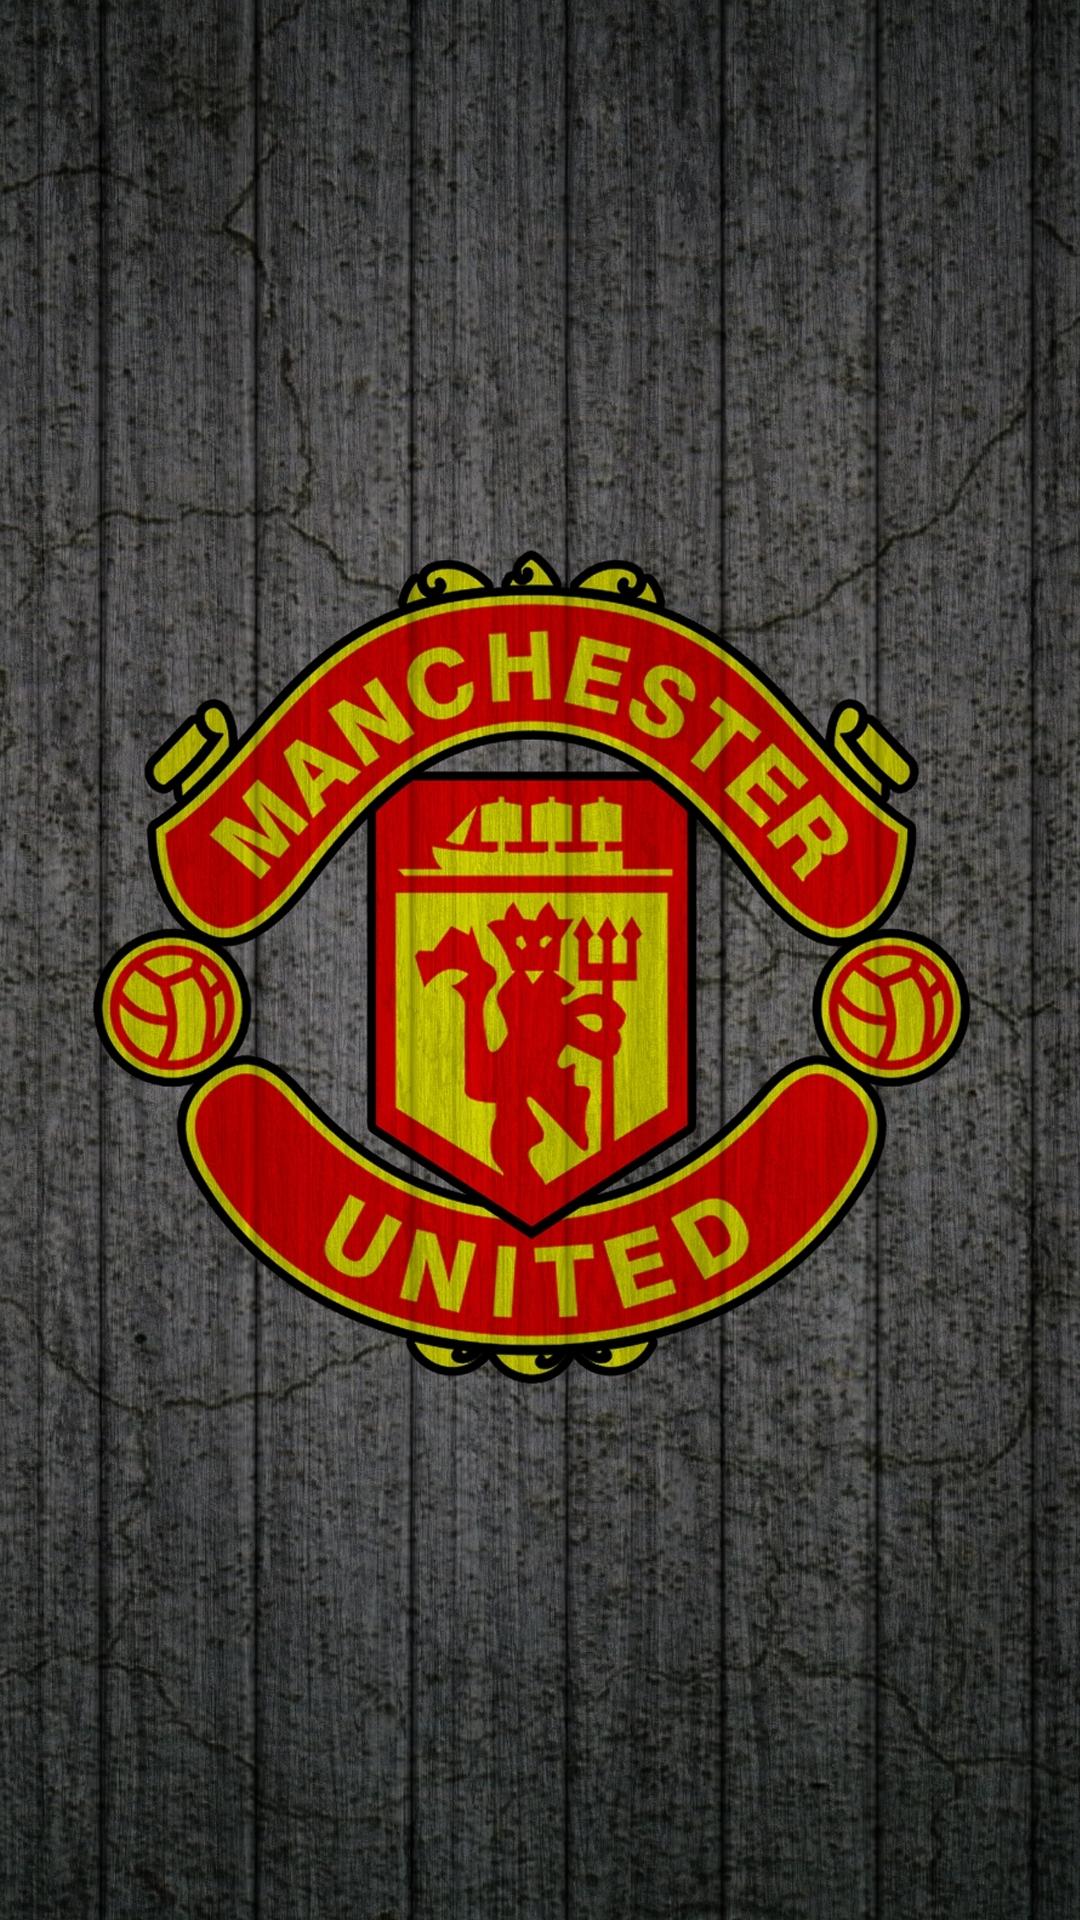 apple iphone 6 plus hd wallpaper – manchester united logo | hd